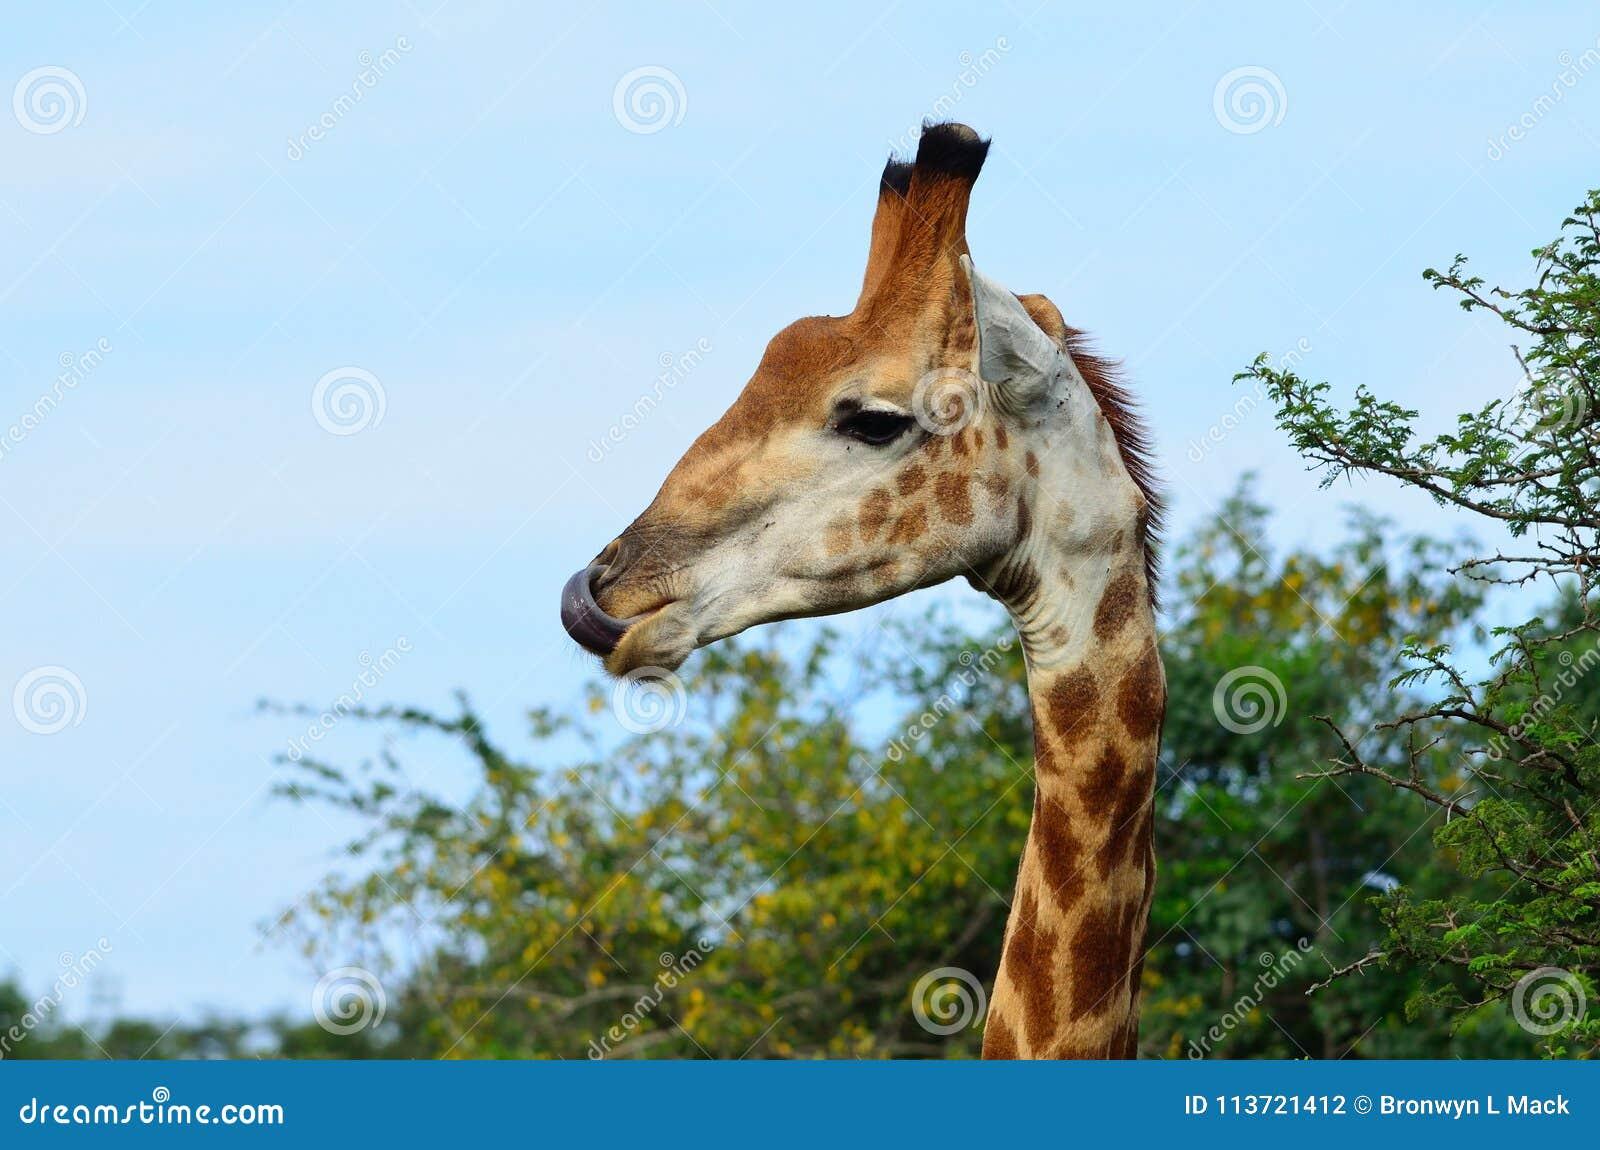 Жираф лижа свой нос в Африке